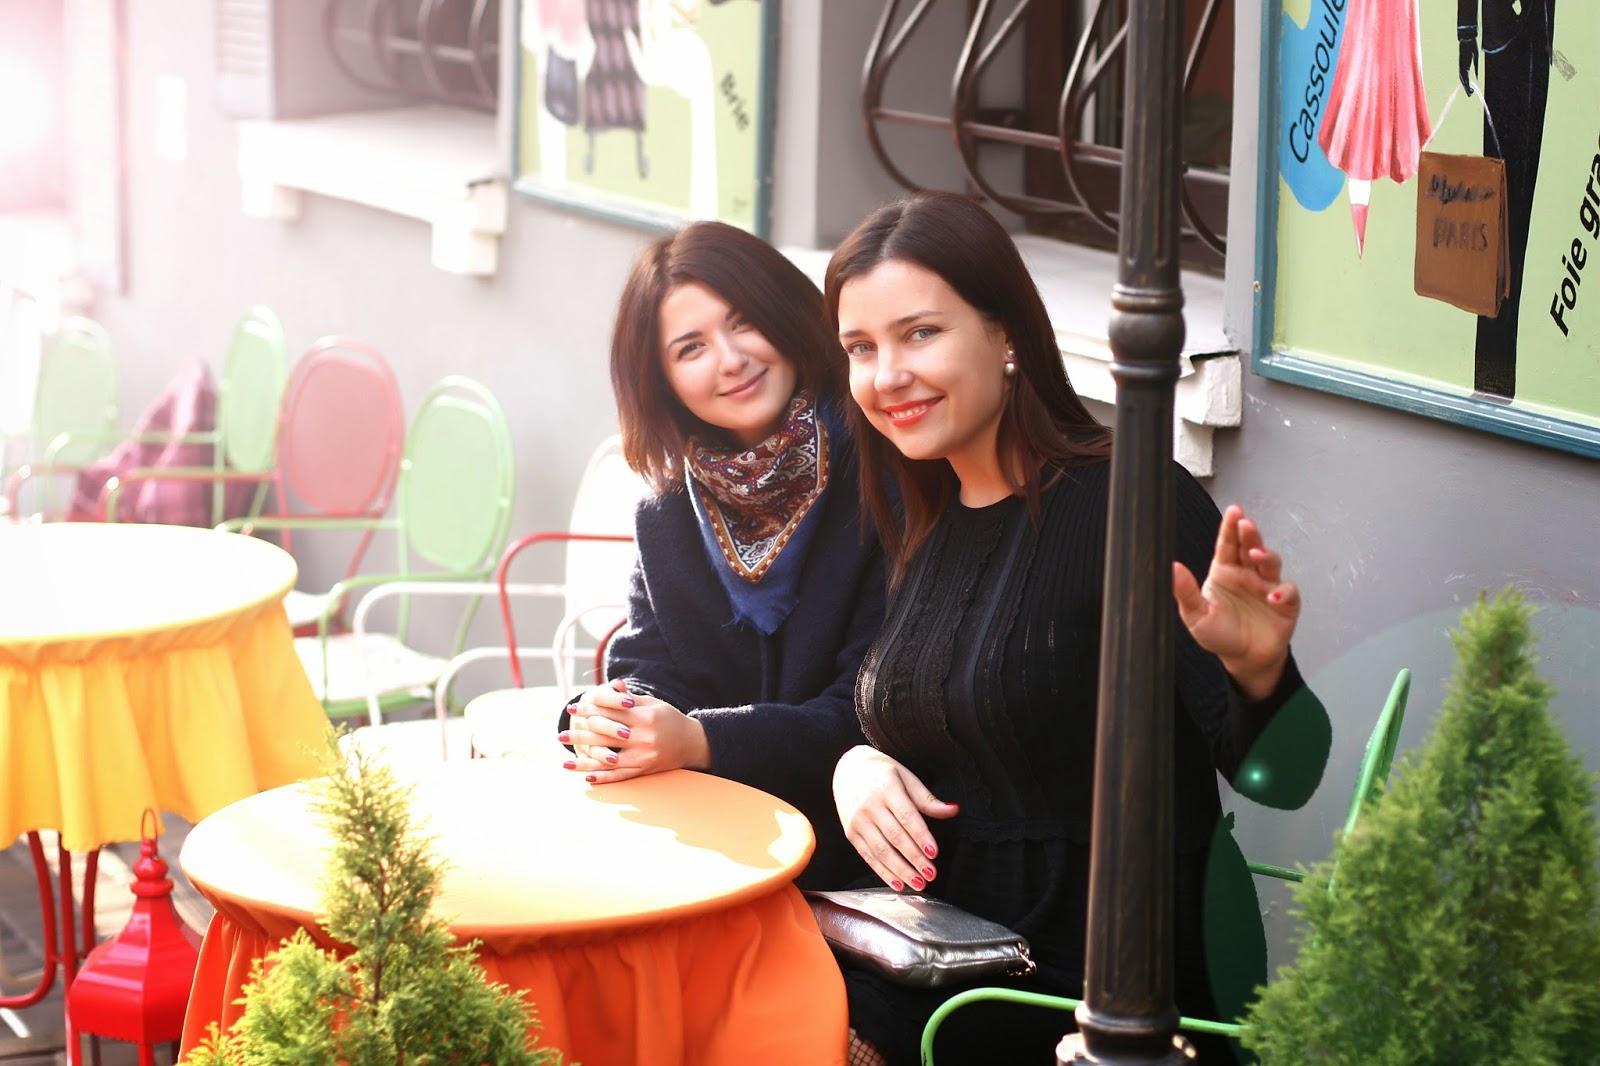 Татьяна Белз и ее авторский парфюм Mola Mola «Passion sous la Coupole»